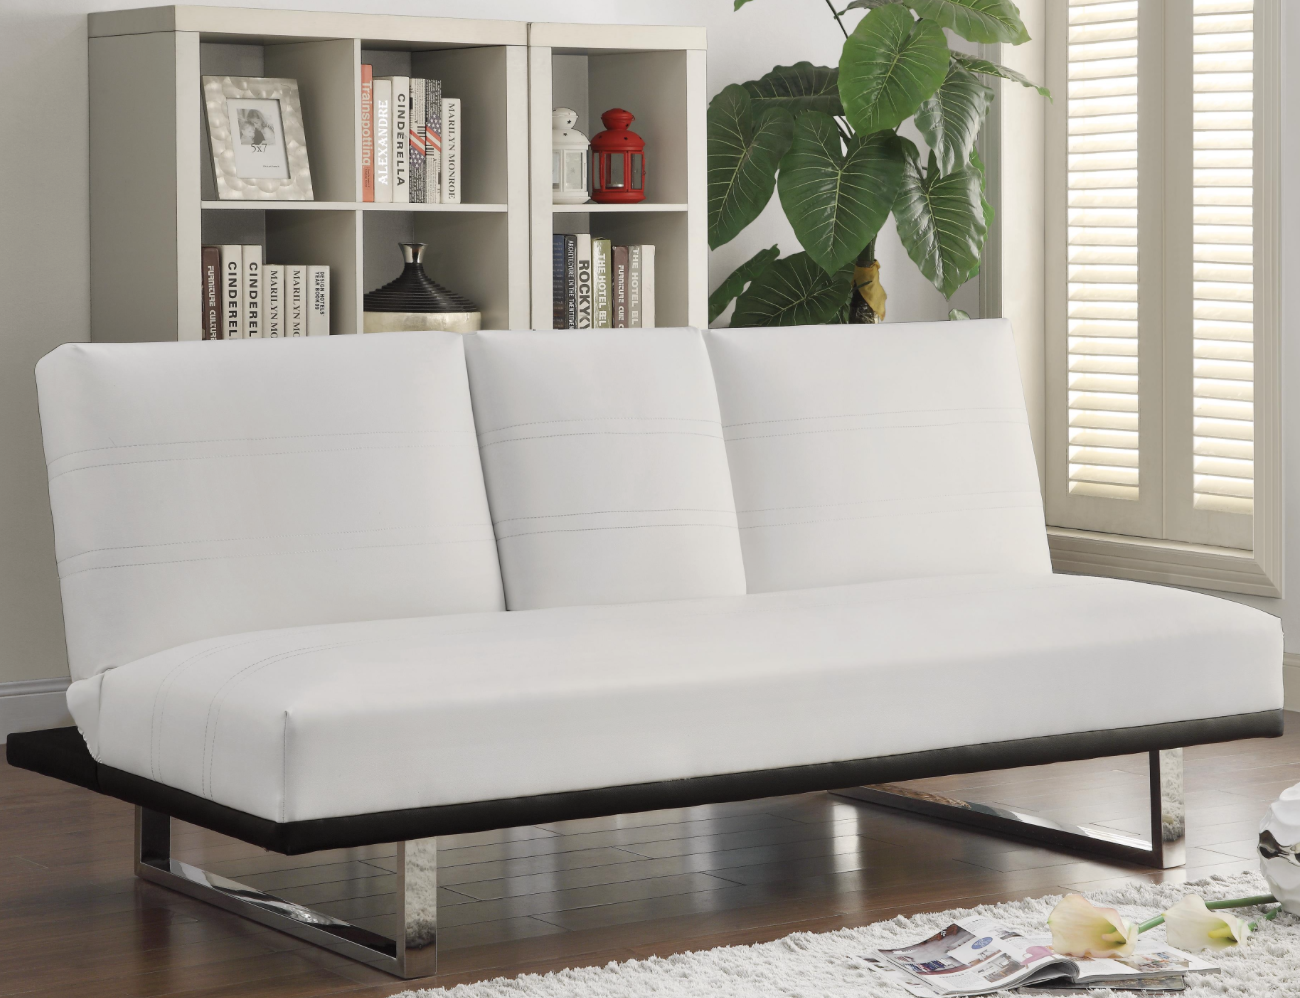 austin futon austin futon  u2014 coco furniture gallery furnishing dreams  rh   shopcocofurniture